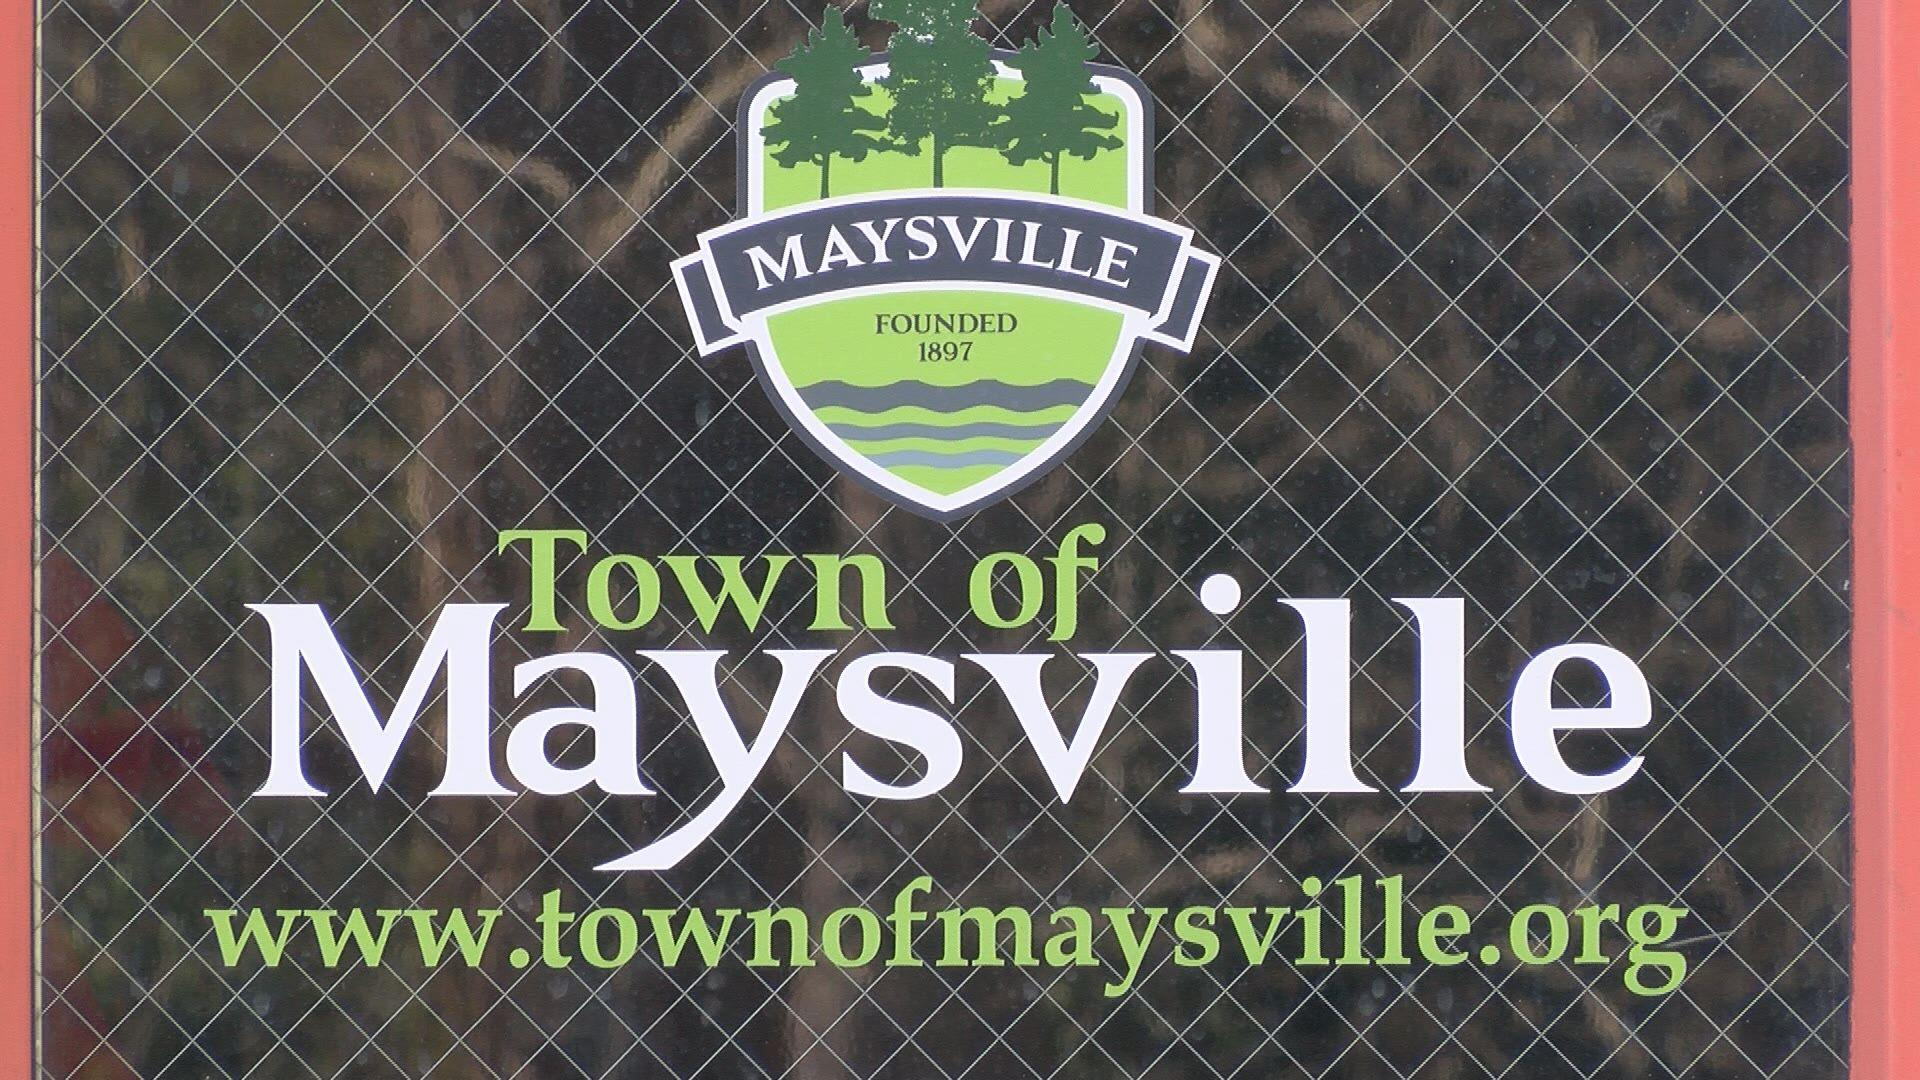 maysville_149227